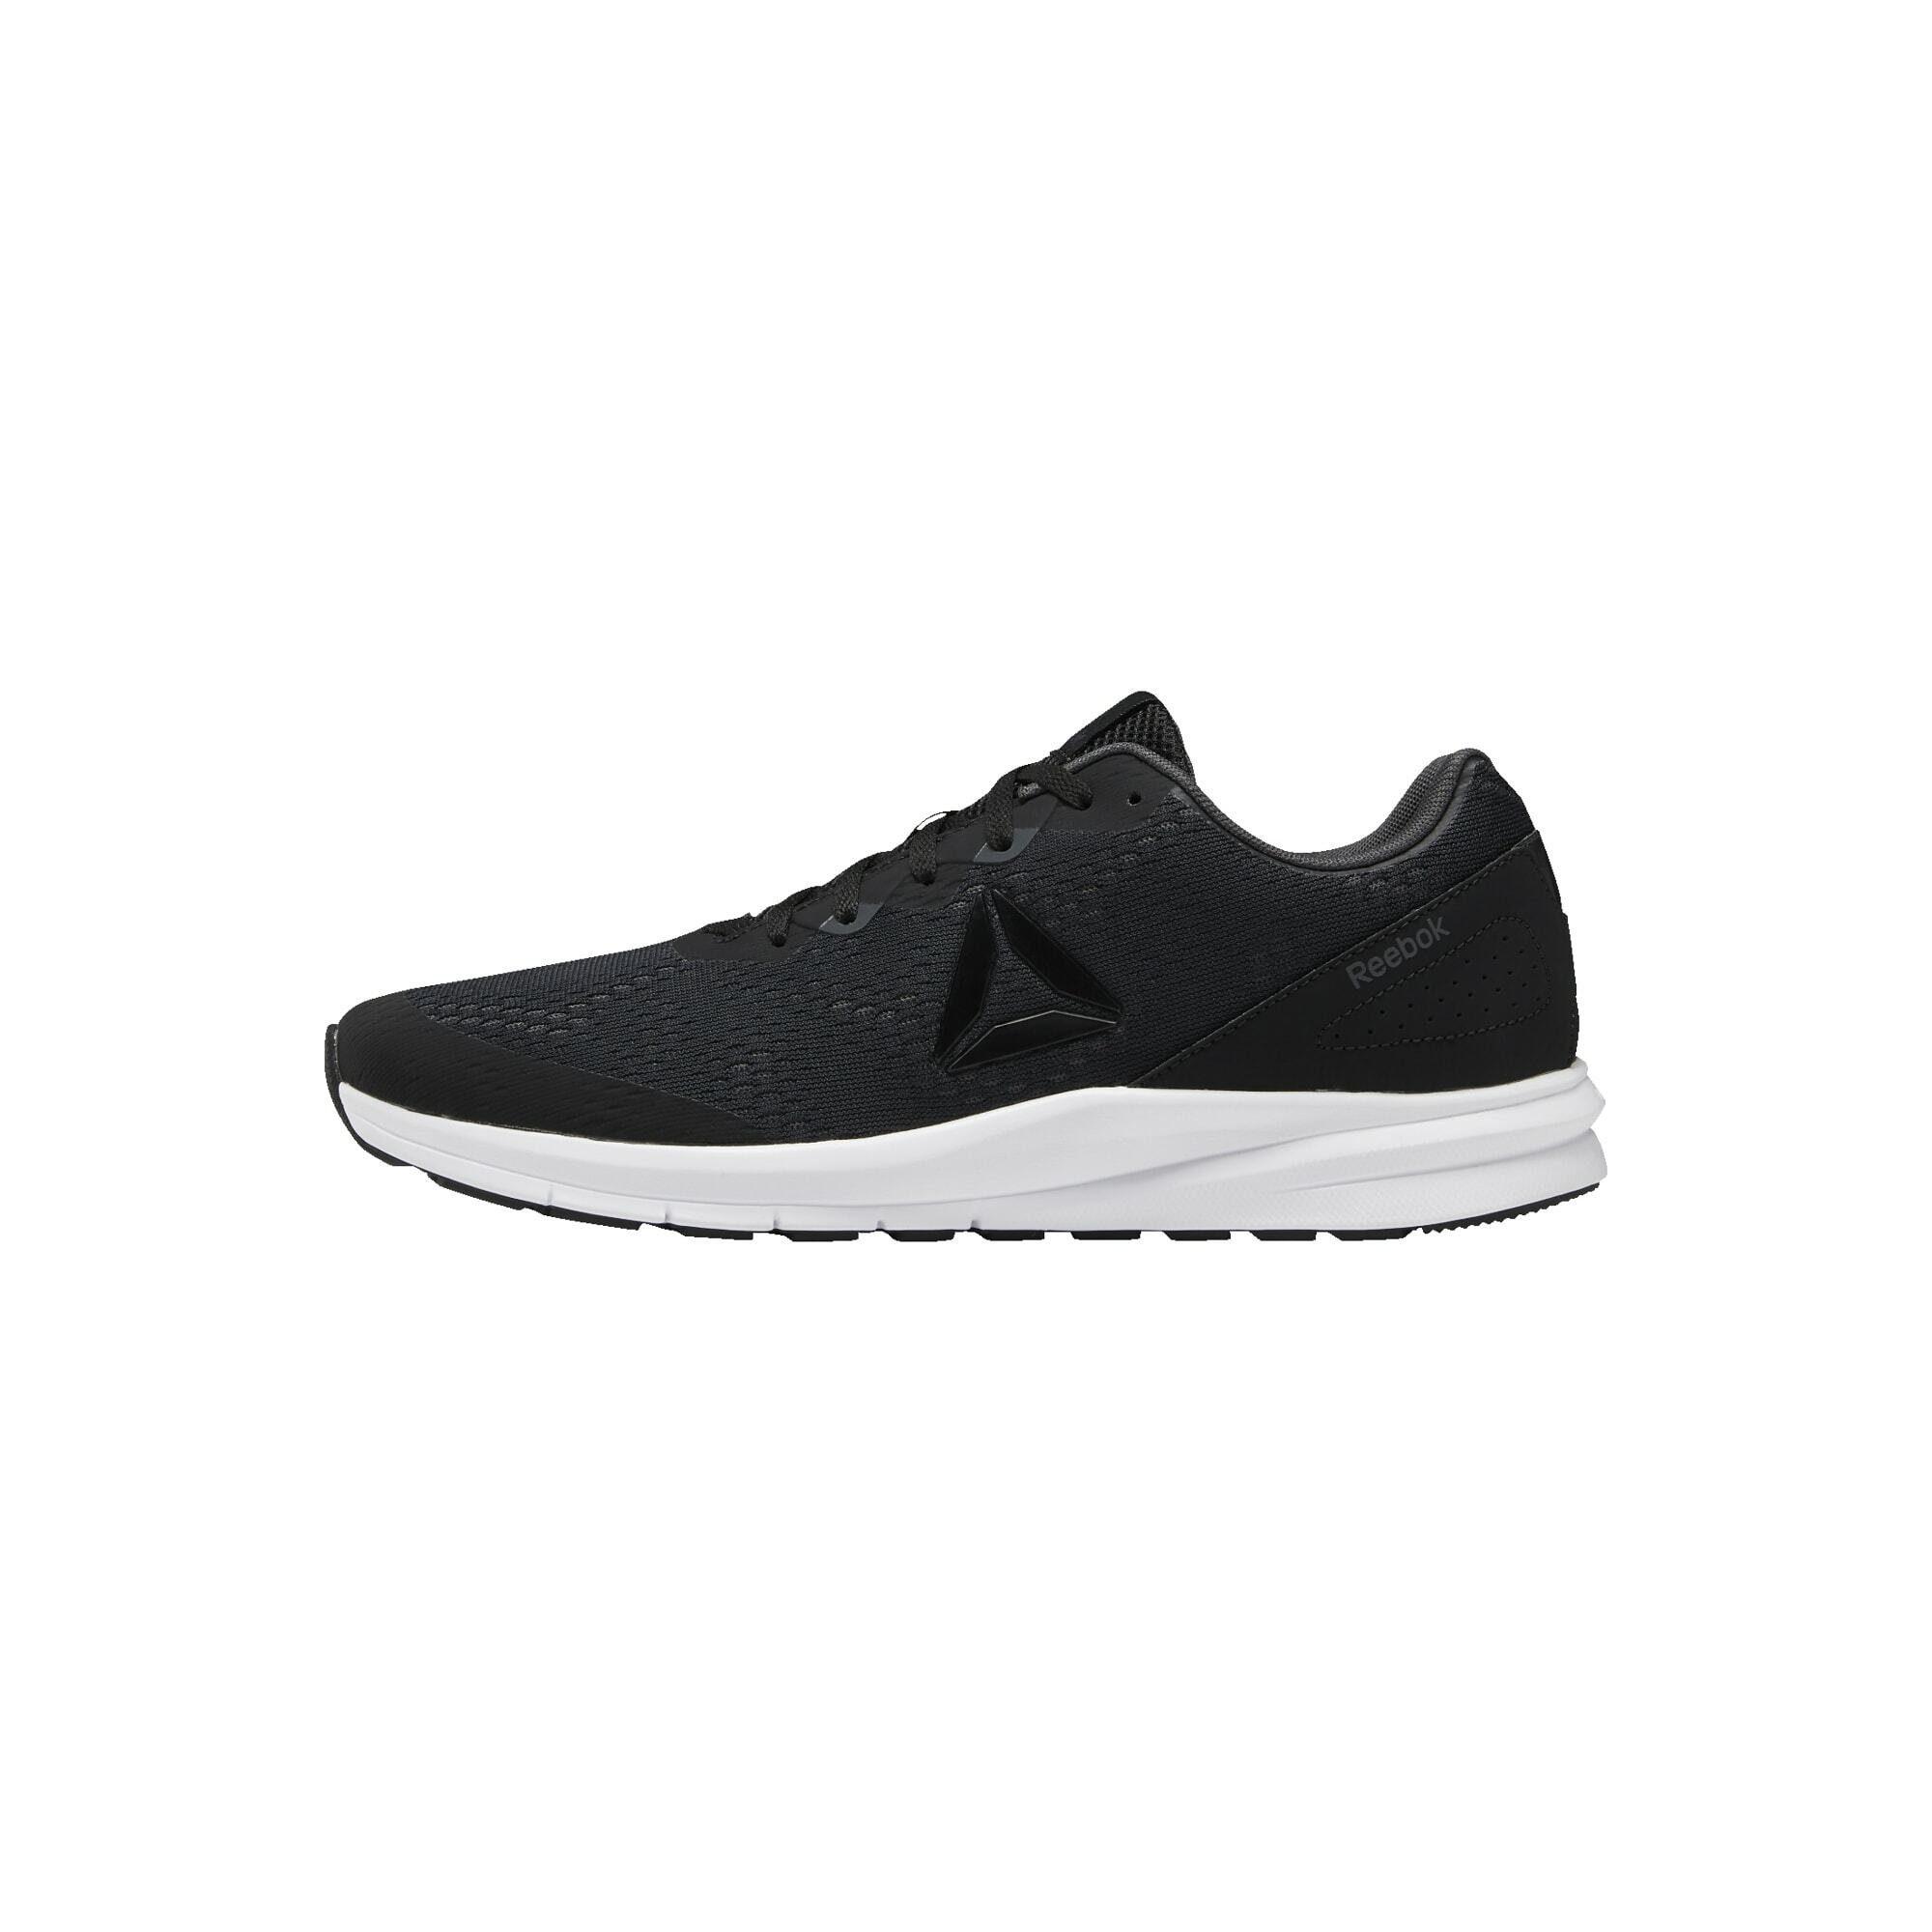 Reebok Rush Runner 3.0 Shoes Grau | Reebok Deutschland